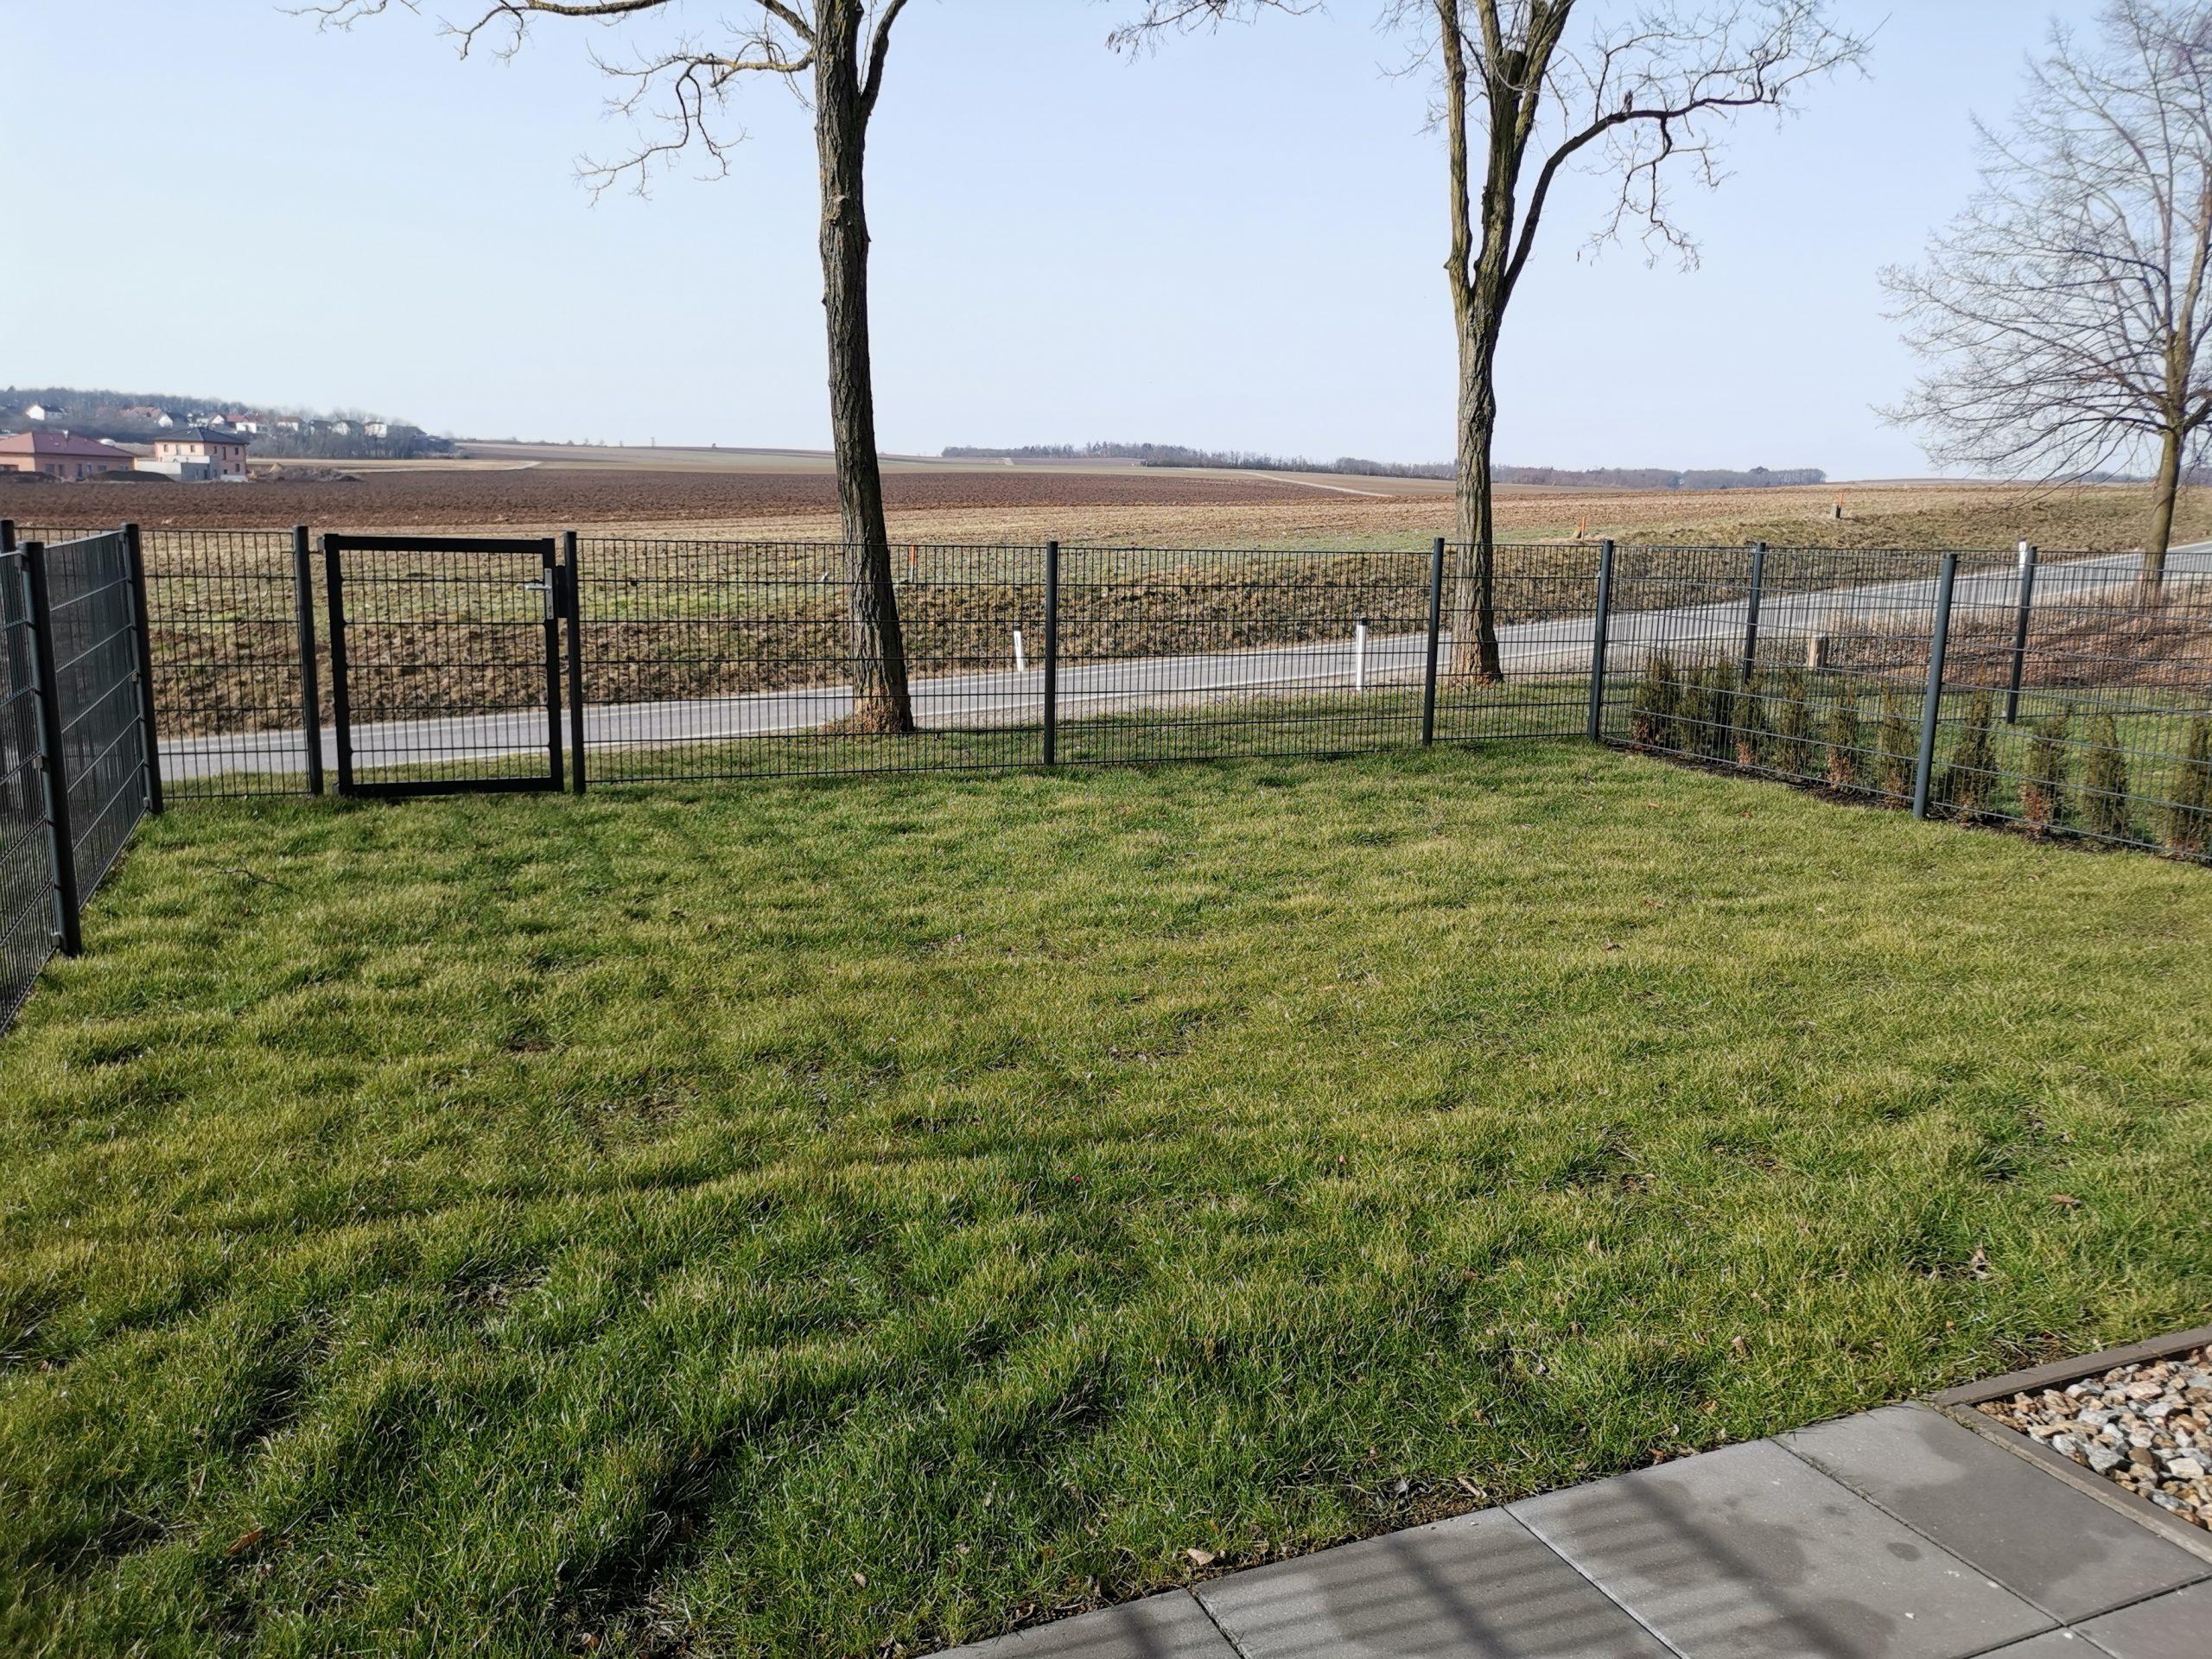 Immobilie von Kamptal in 3730 Eggenburg, Horn, Eggenburg VII - Top 203 #3